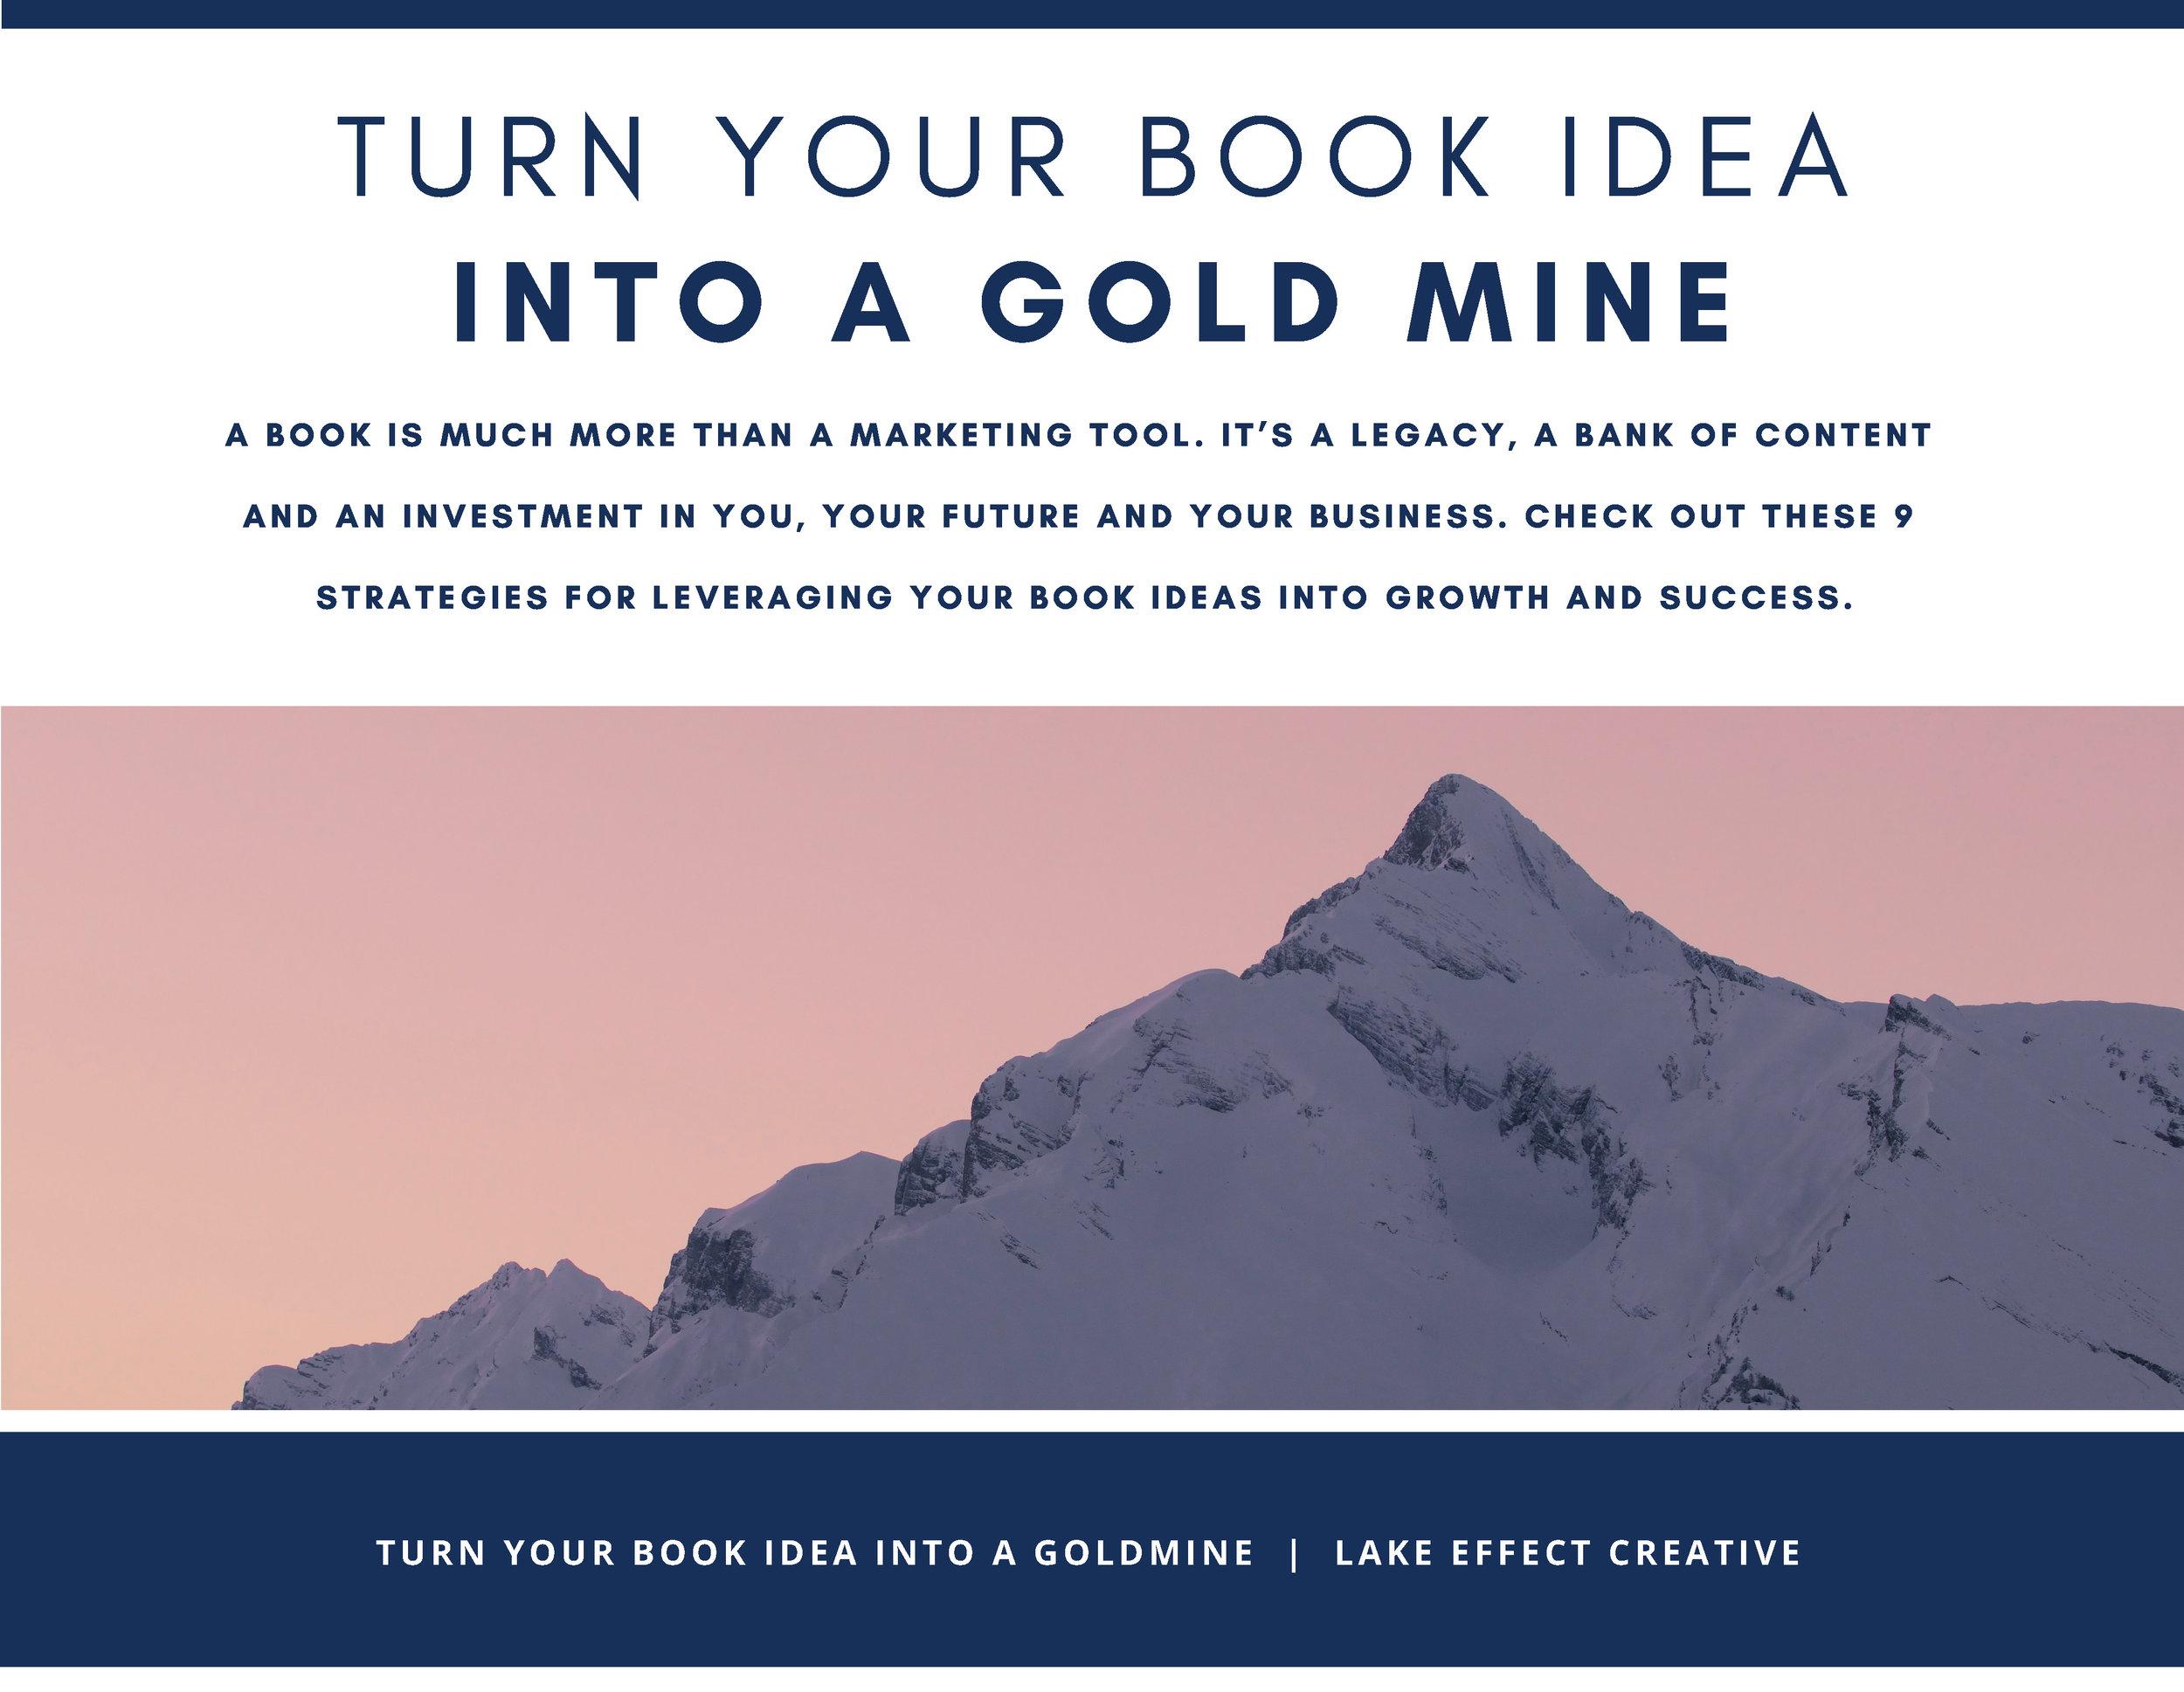 LAKE EFFECT CREATIVE - BOOK IDEA_Page_01.jpg